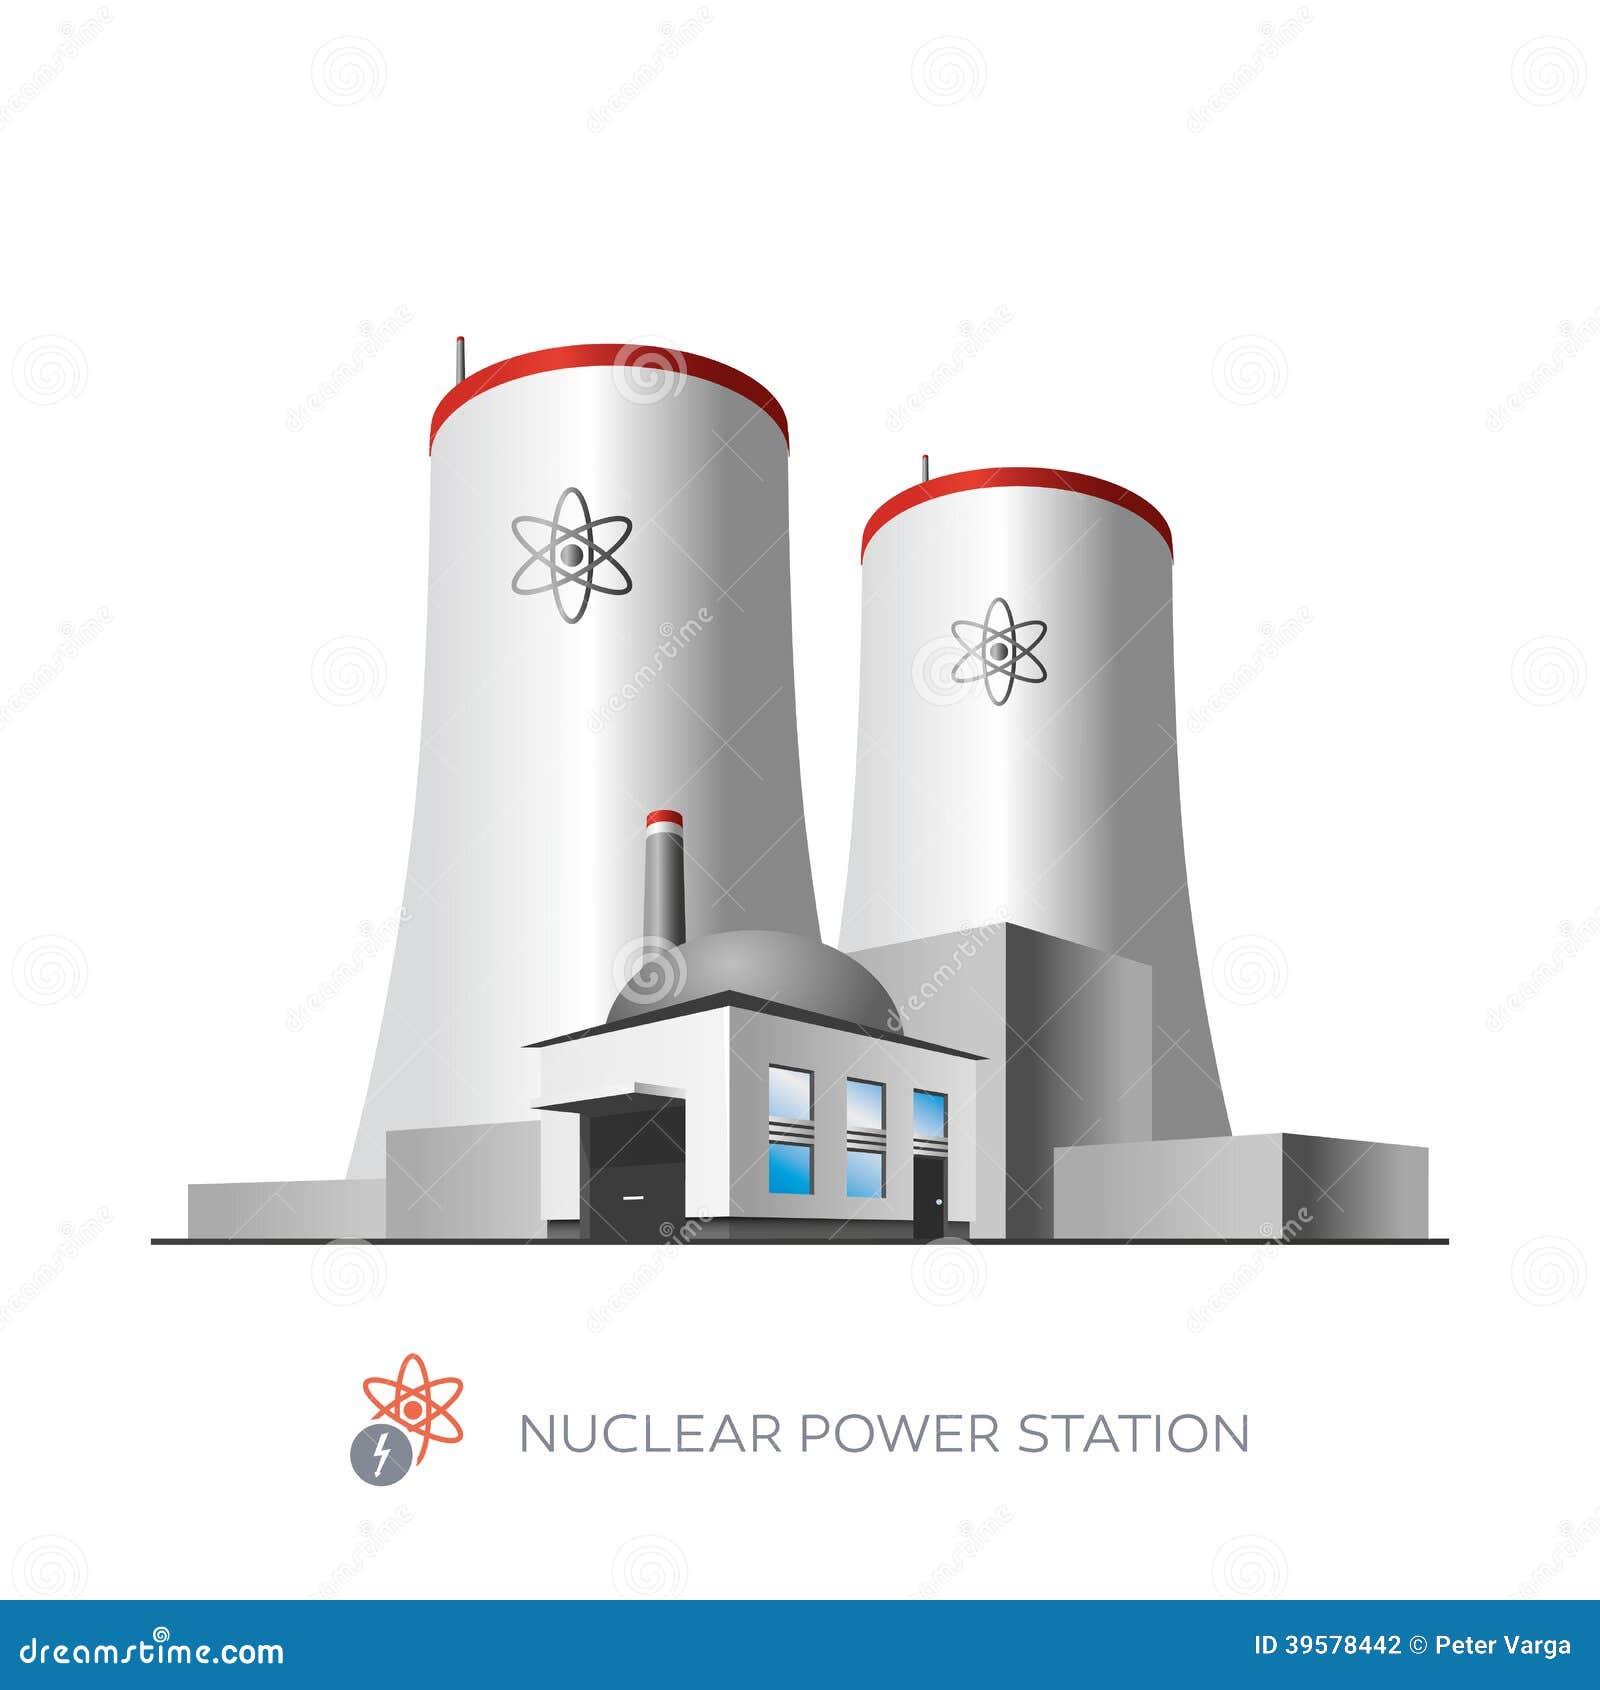 Cartoon Nuclear Power Plant Stock Illustrations 965 Cartoon Nuclear Power Plant Stock Illustrations Vectors Clipart Dreamstime